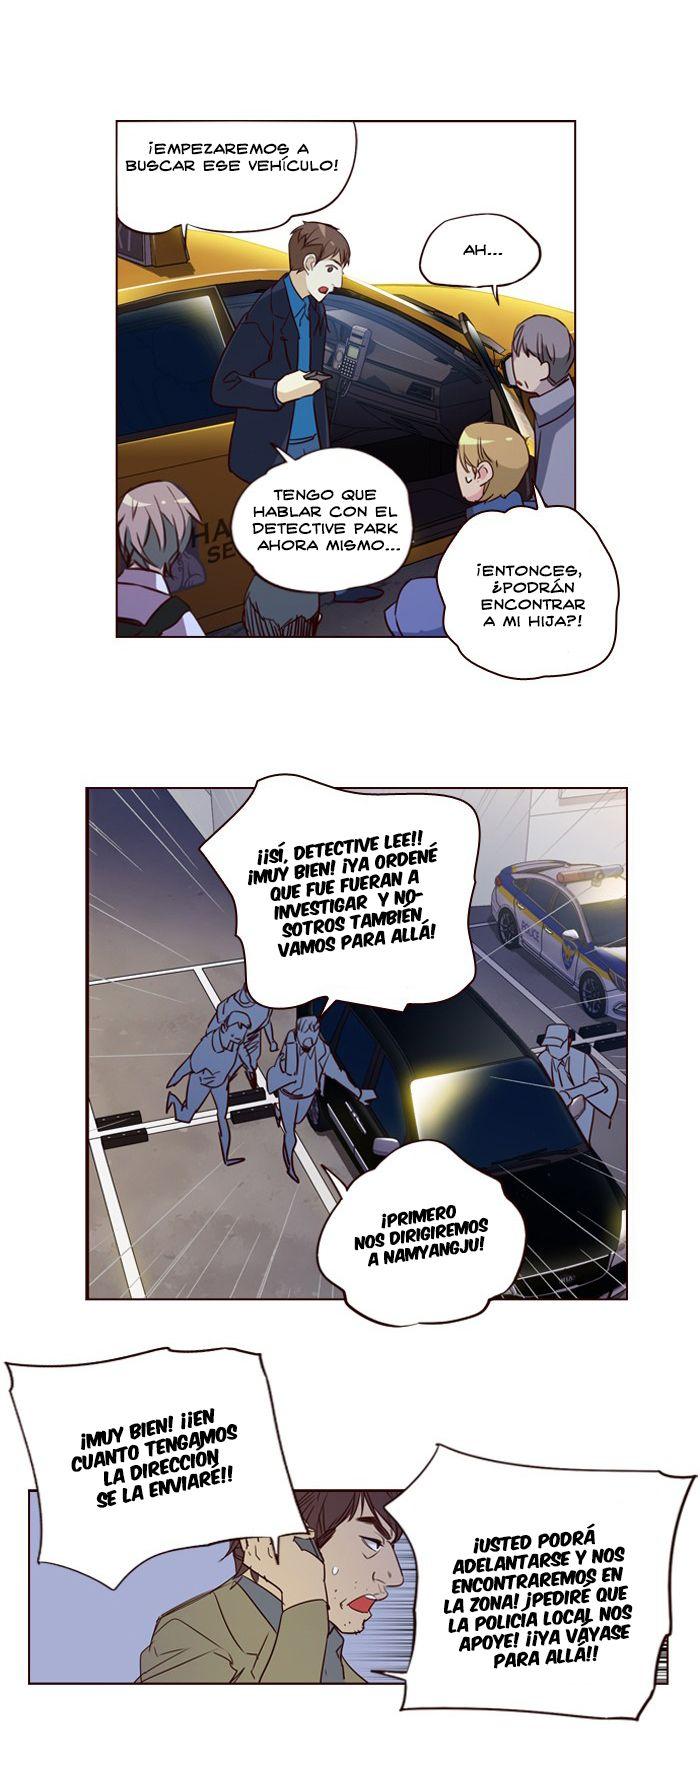 http://c5.ninemanga.com/es_manga/32/416/462763/9d825897e9782df267d7e97eed9cc5b8.jpg Page 8